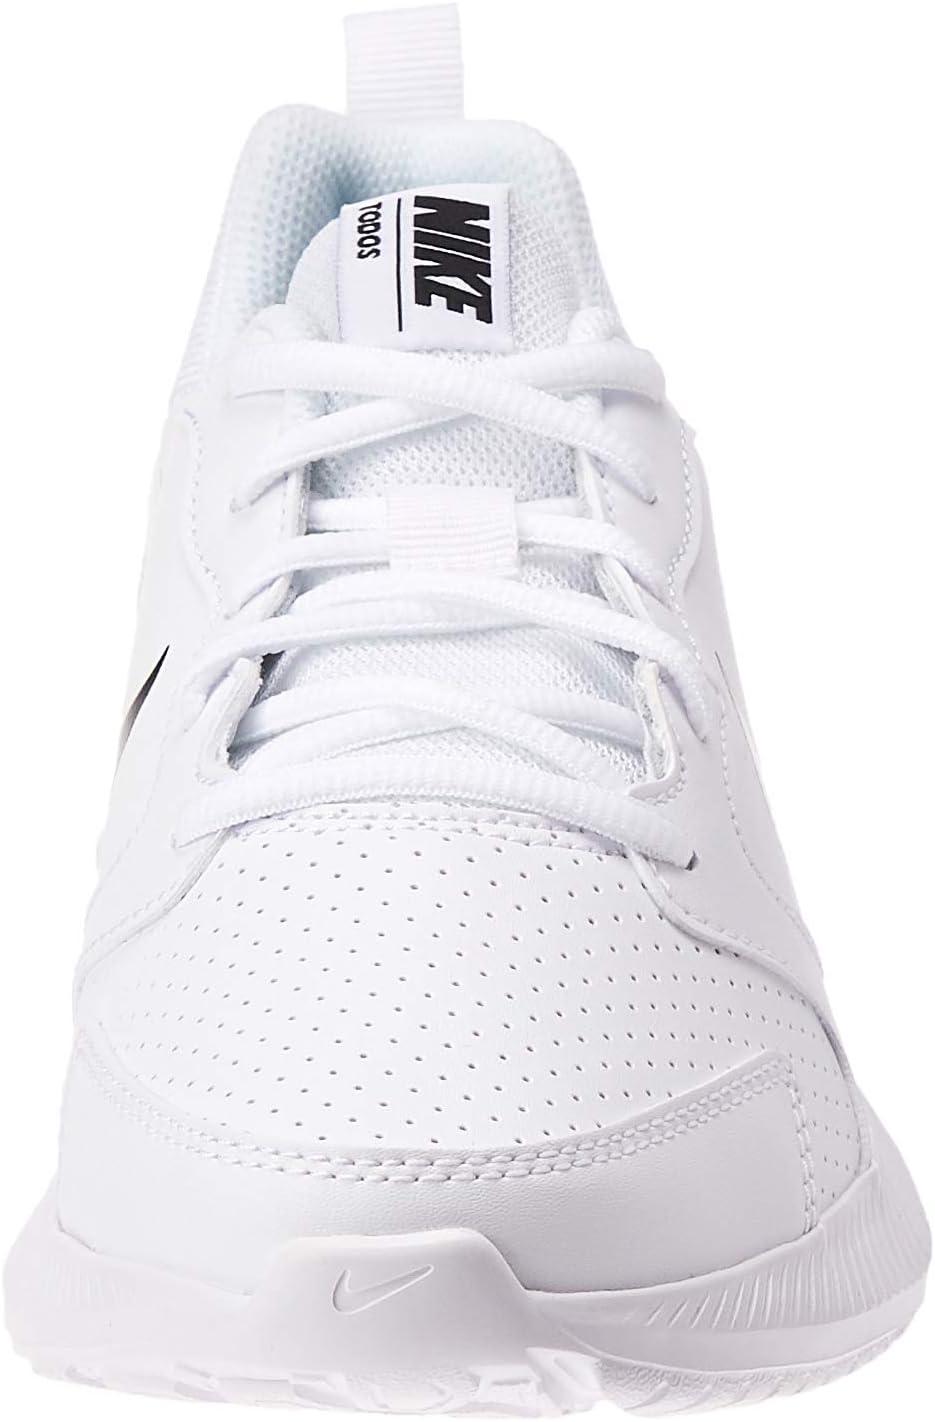 Nike Todos Hardloopschoenen voor dames White White Black 101